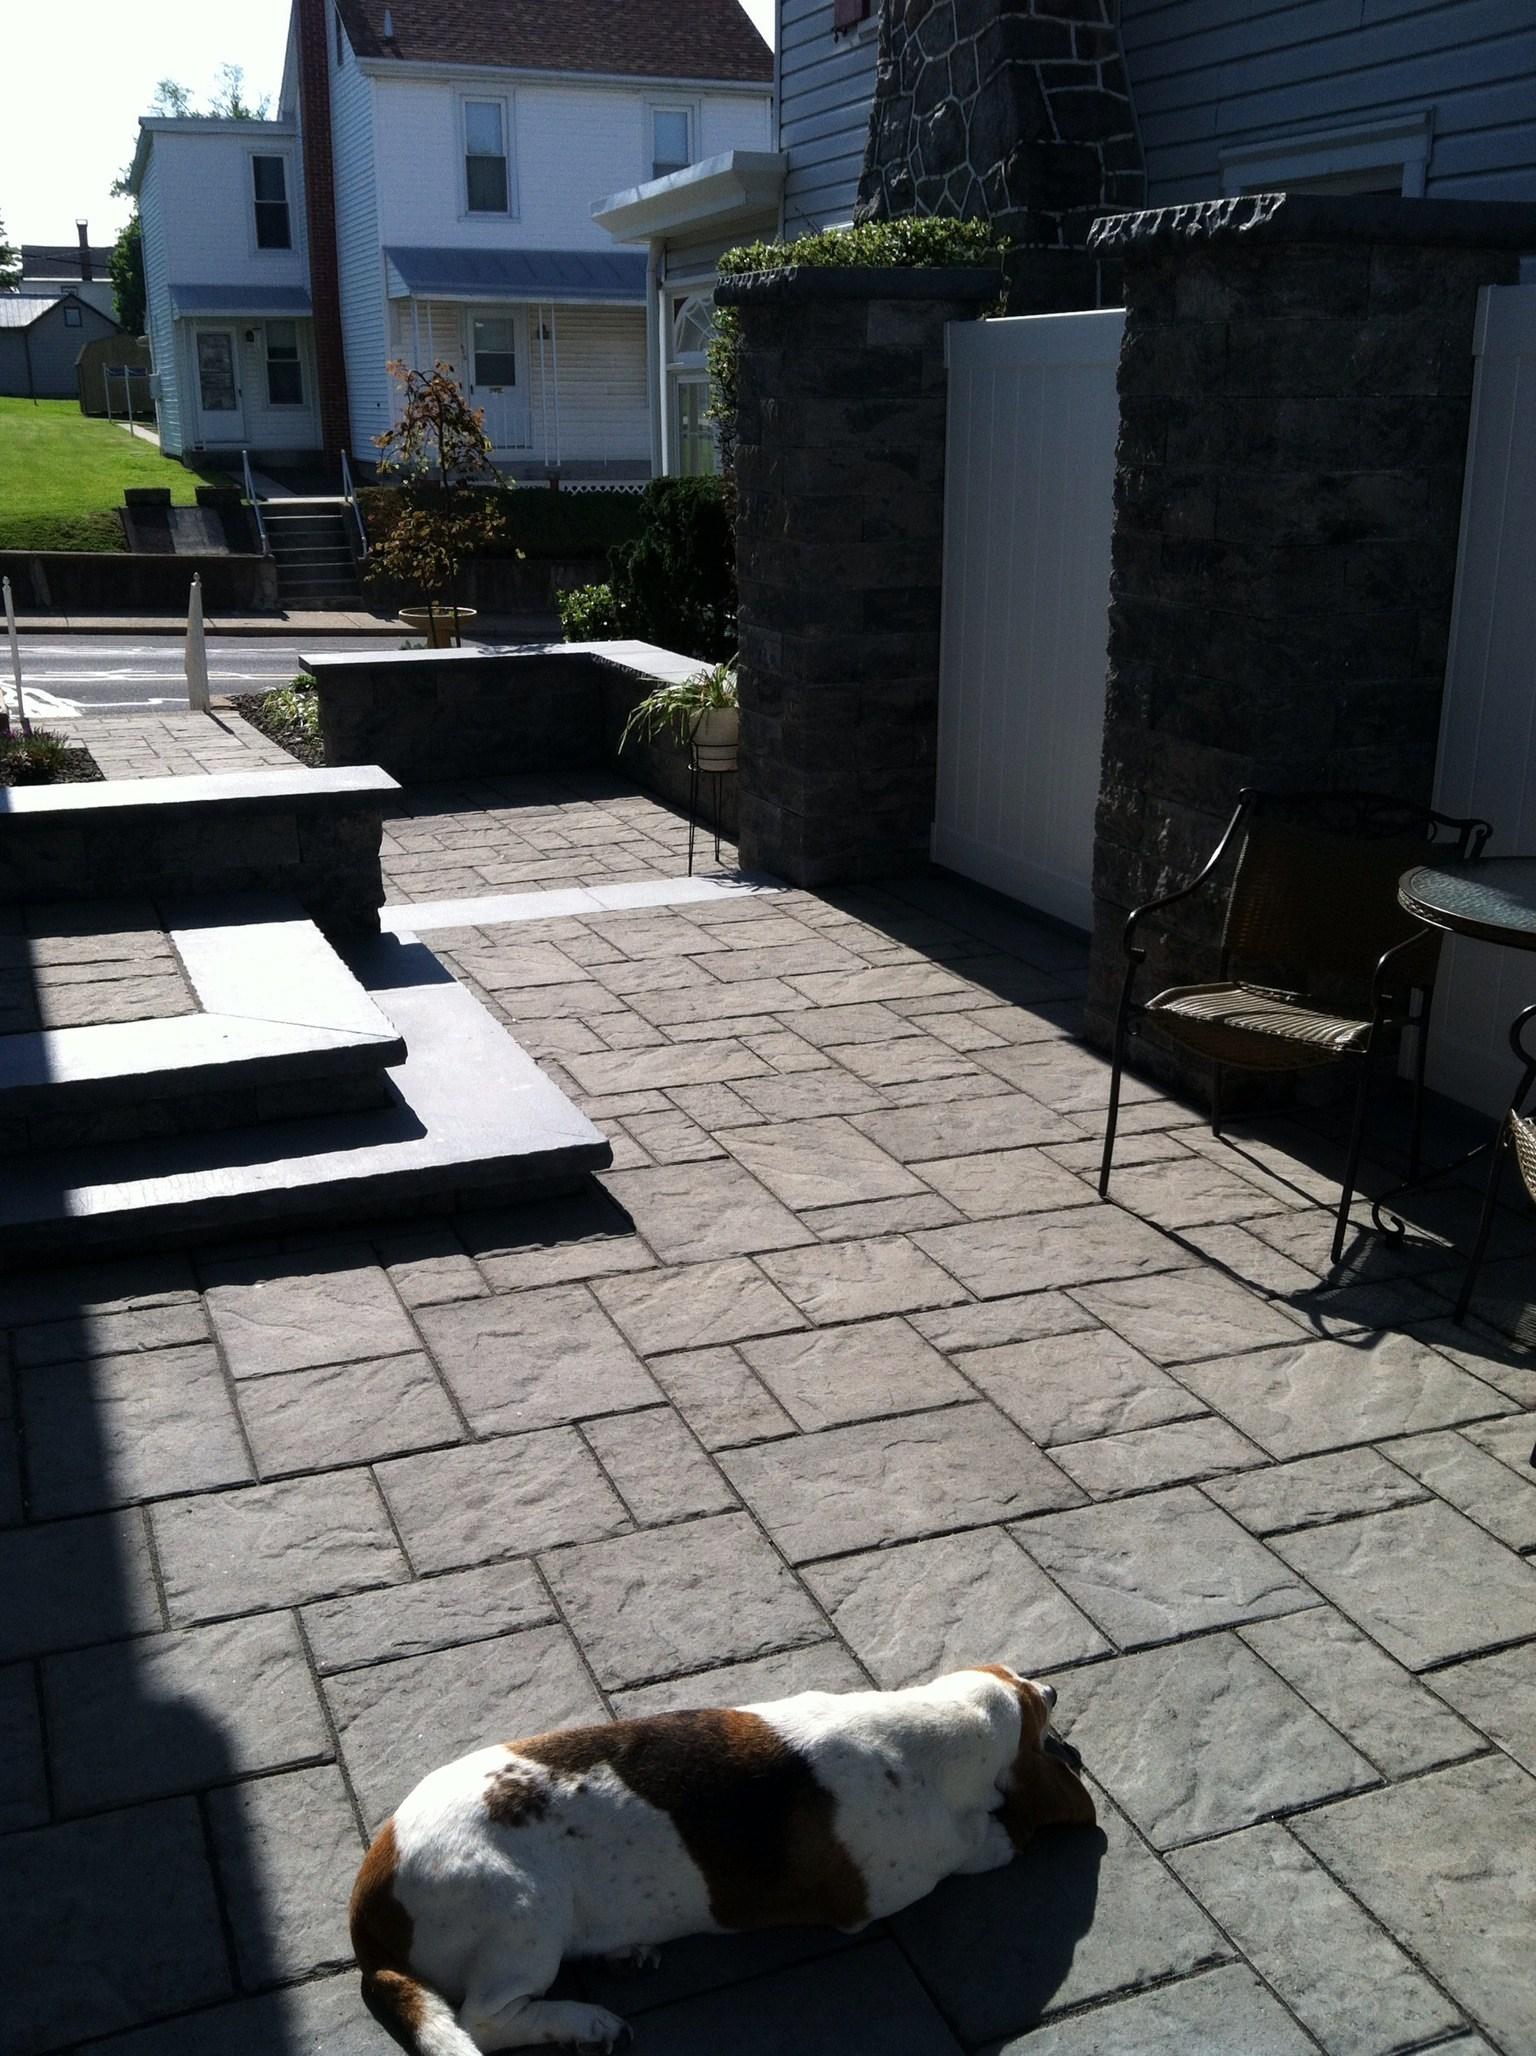 Professional patio landscape design inSchuylkill County, PA